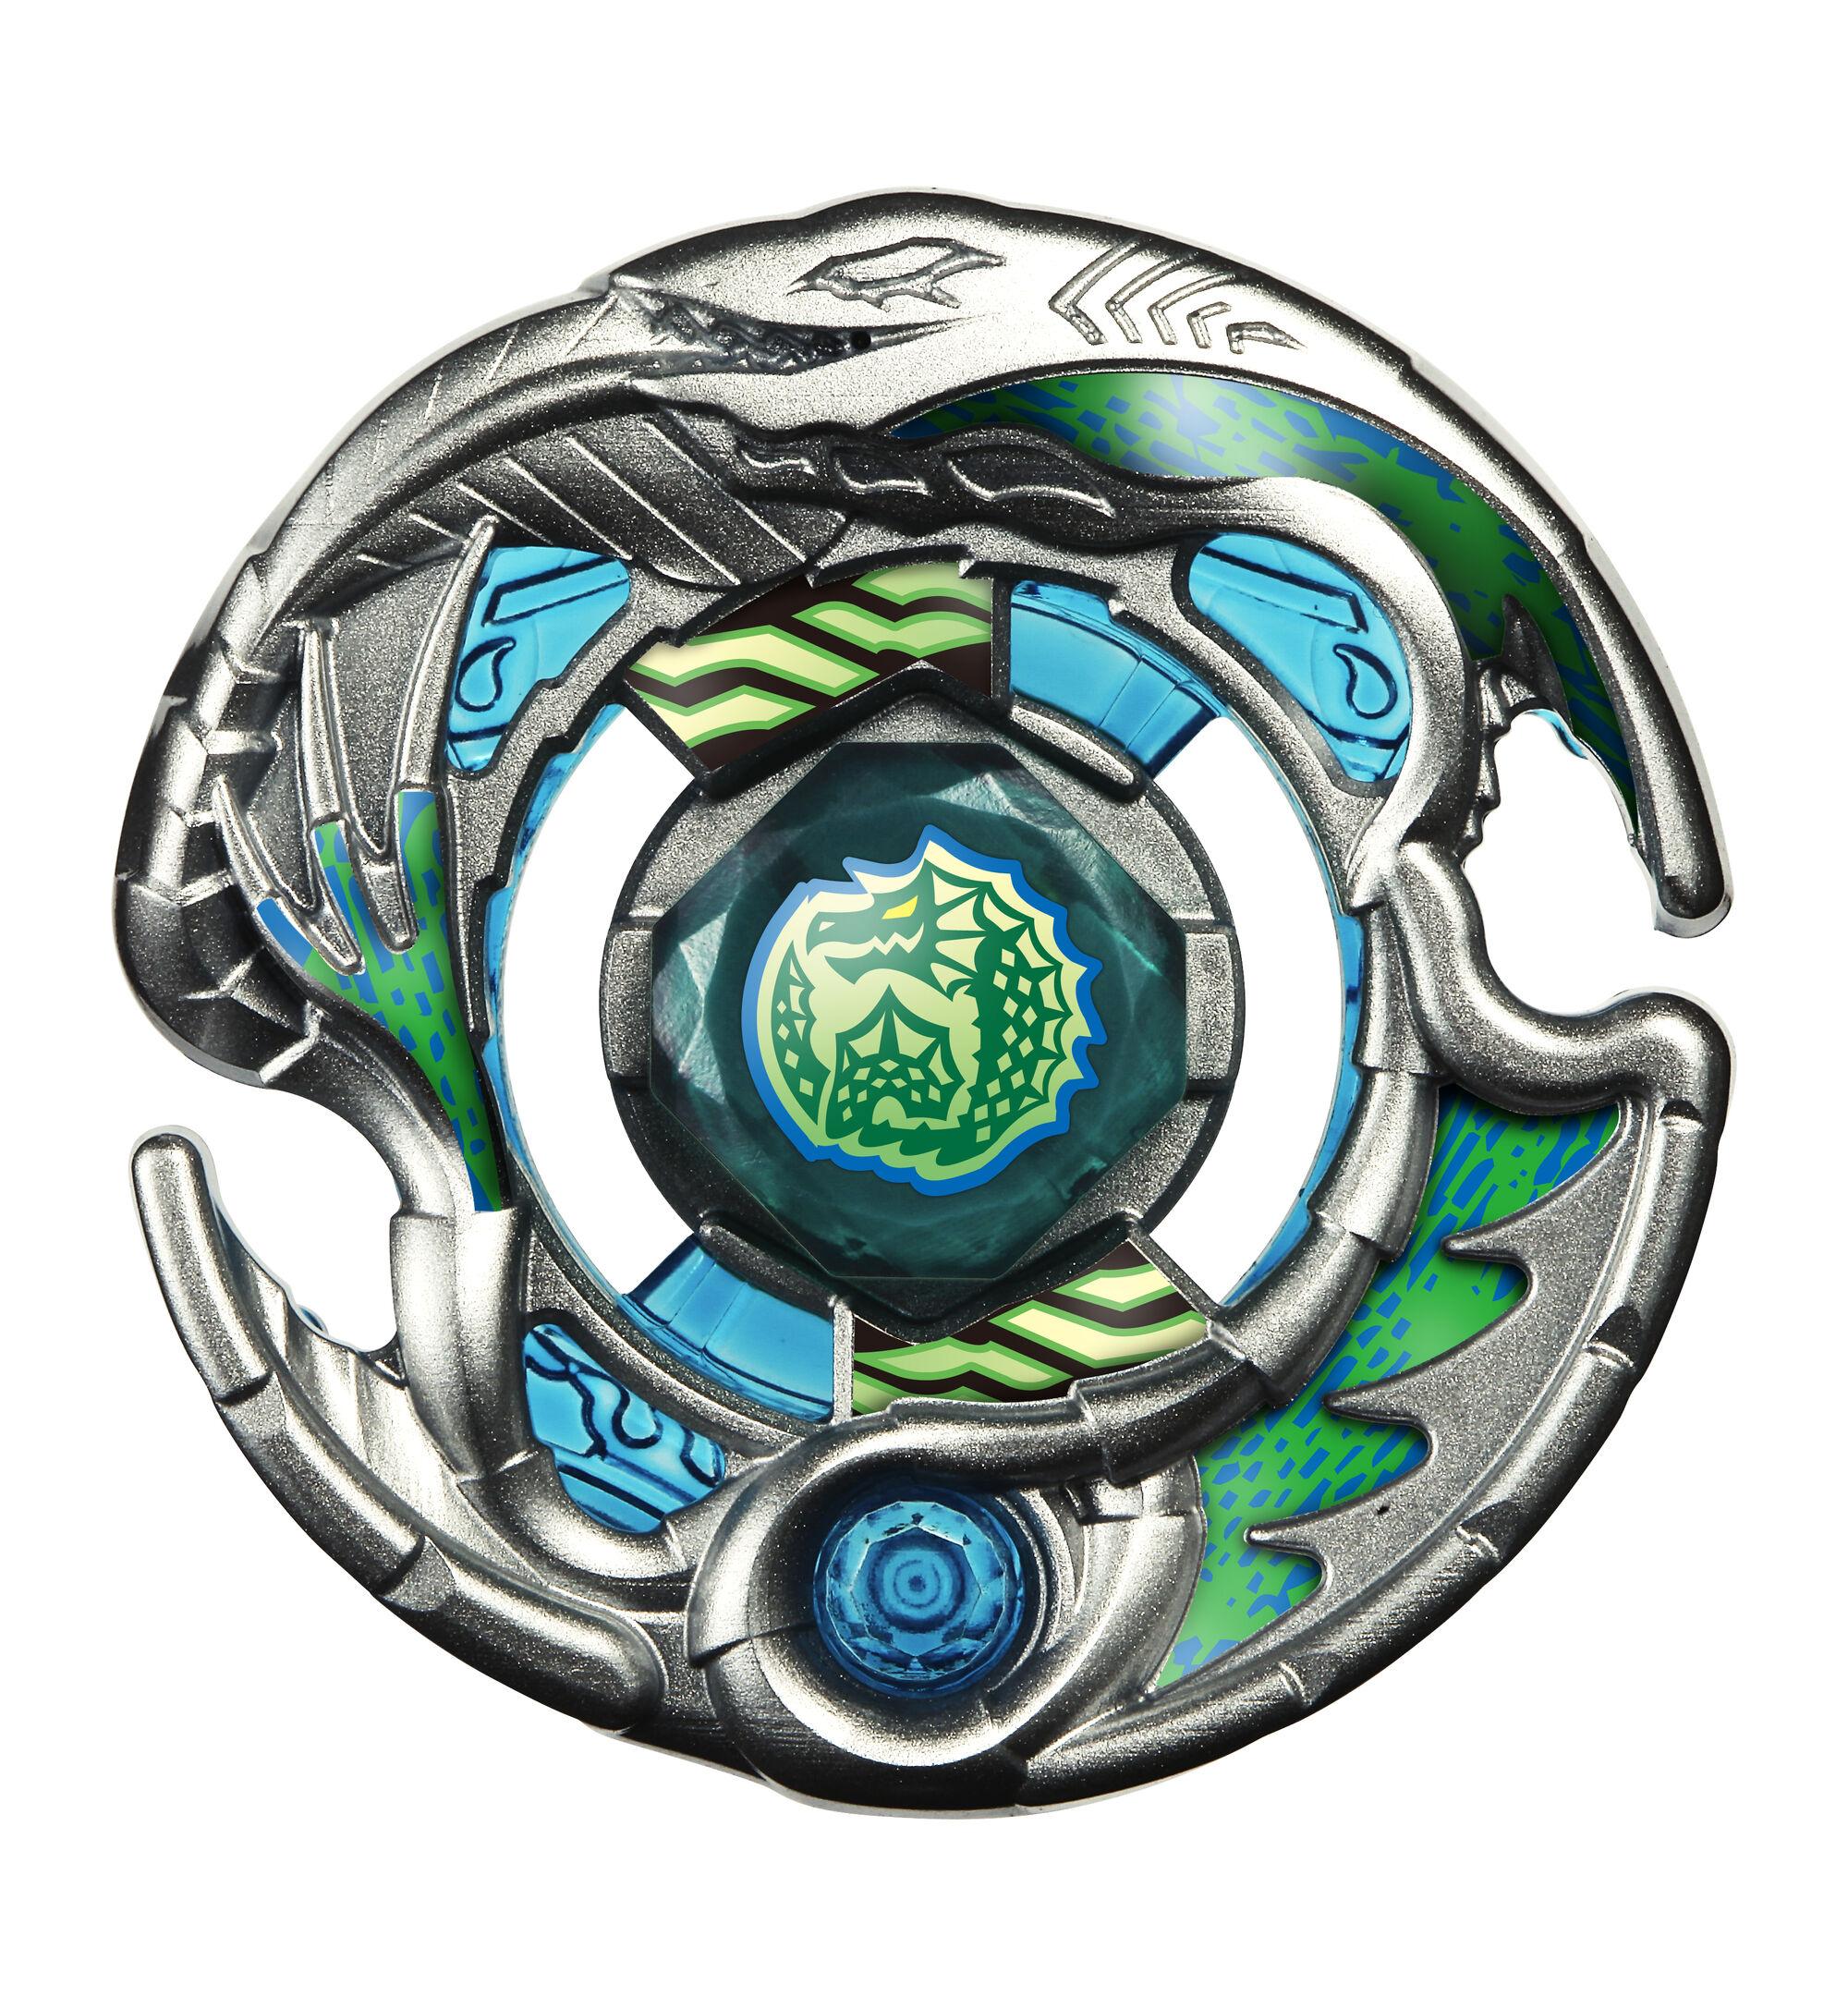 Guardian leviathan 160sb beyblade wiki fandom powered - Toupie beyblade shogun steel ...